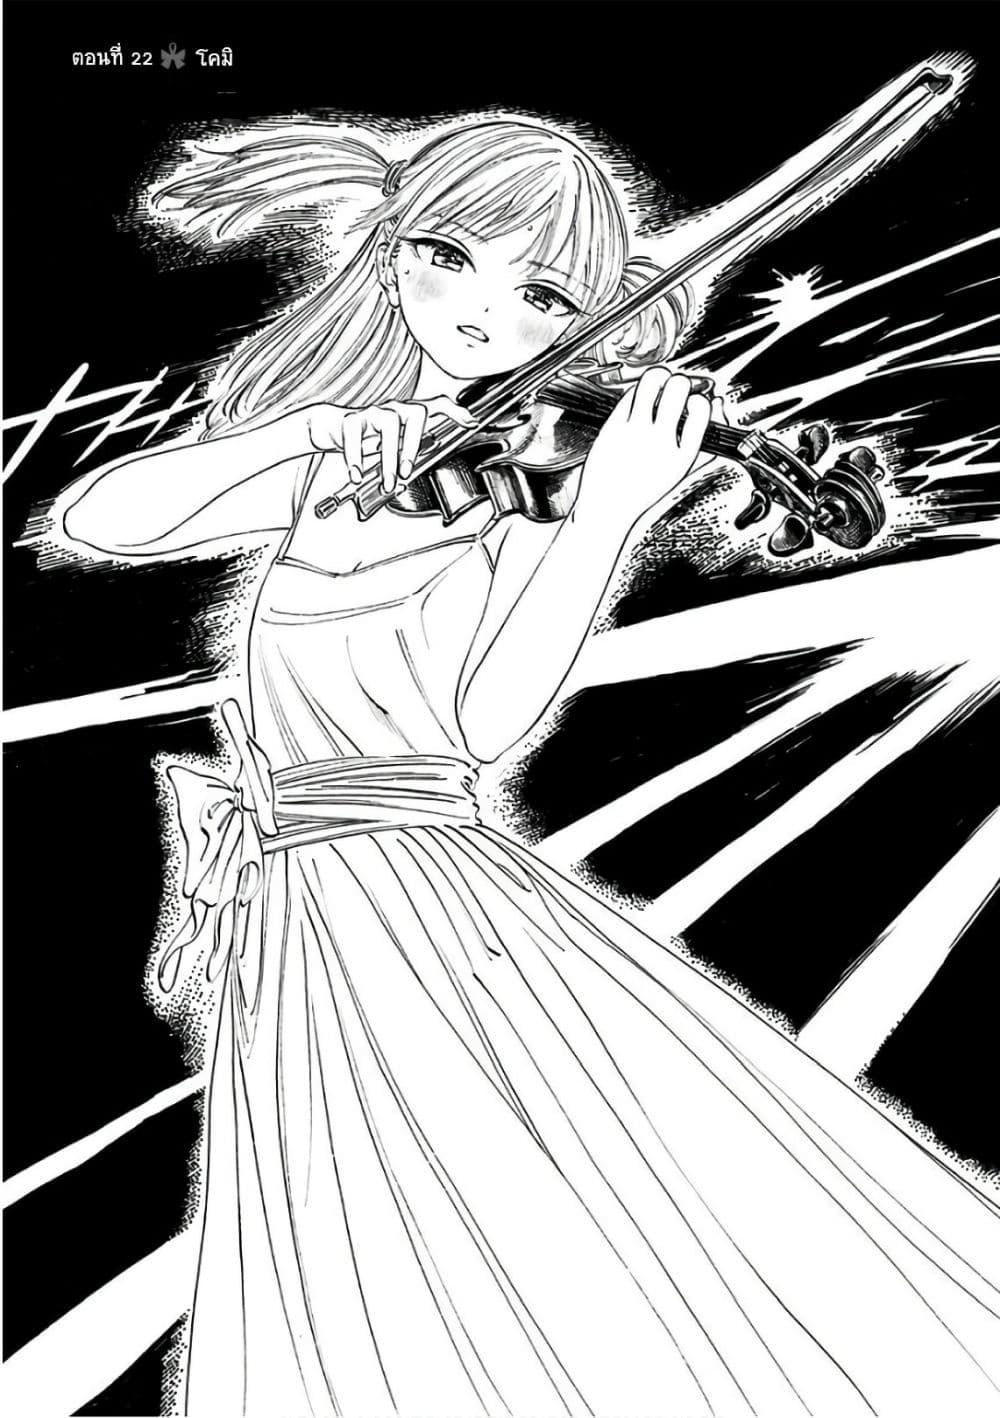 Akebi-chan no Sailor Fuku-ตอนที่ 22